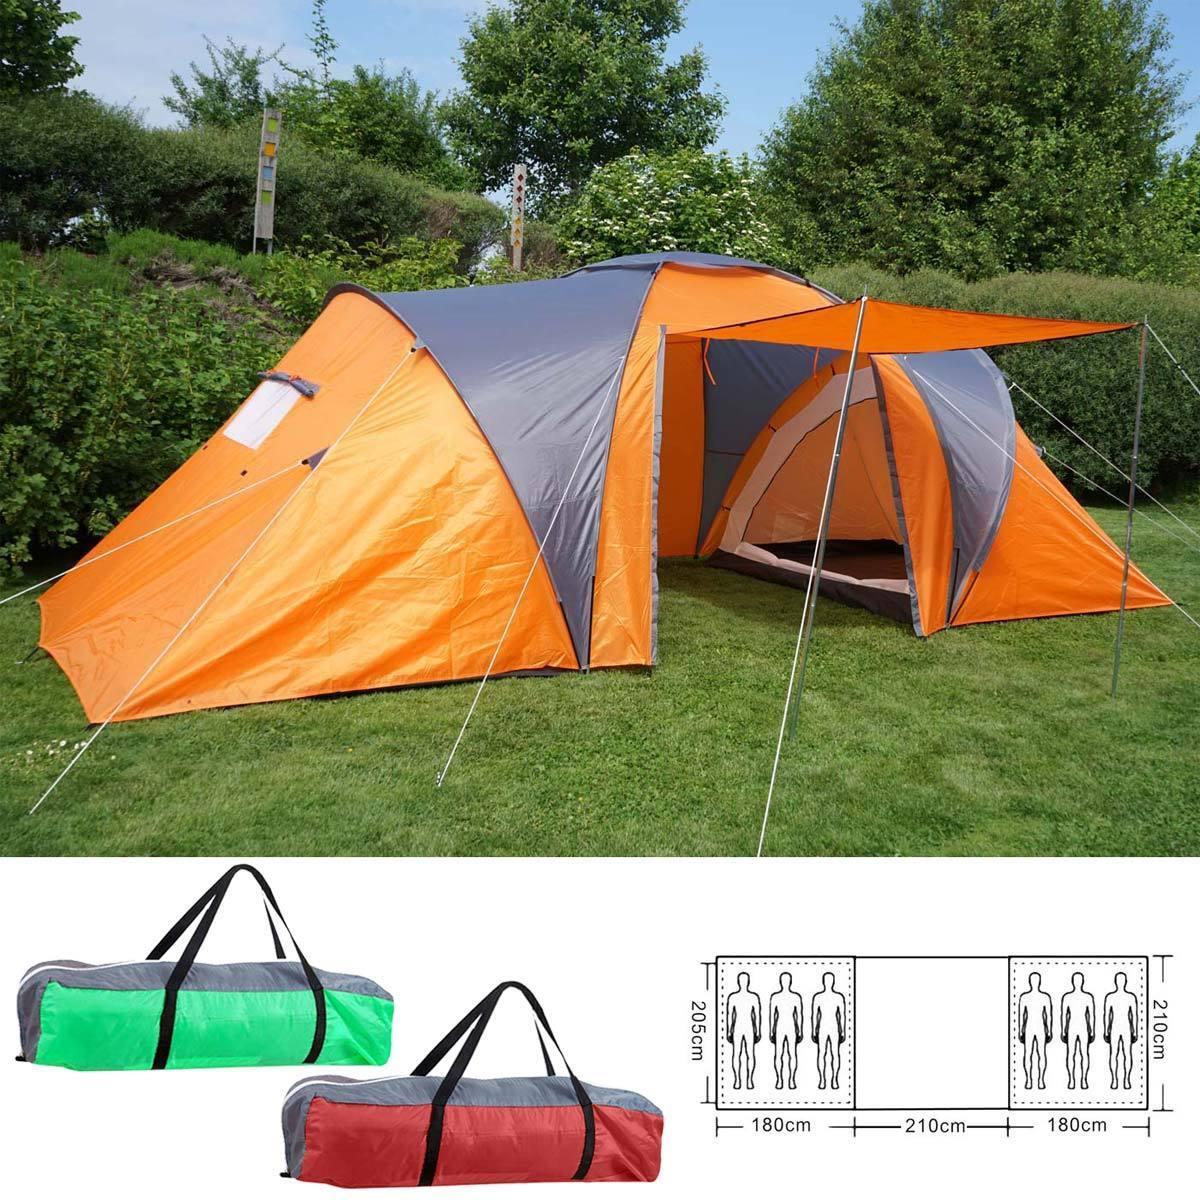 Tenda da campeggio Loksa, 6Uomo Tenda Cupola Tenda Igloo Tenda FestivalTenda, 6 persone